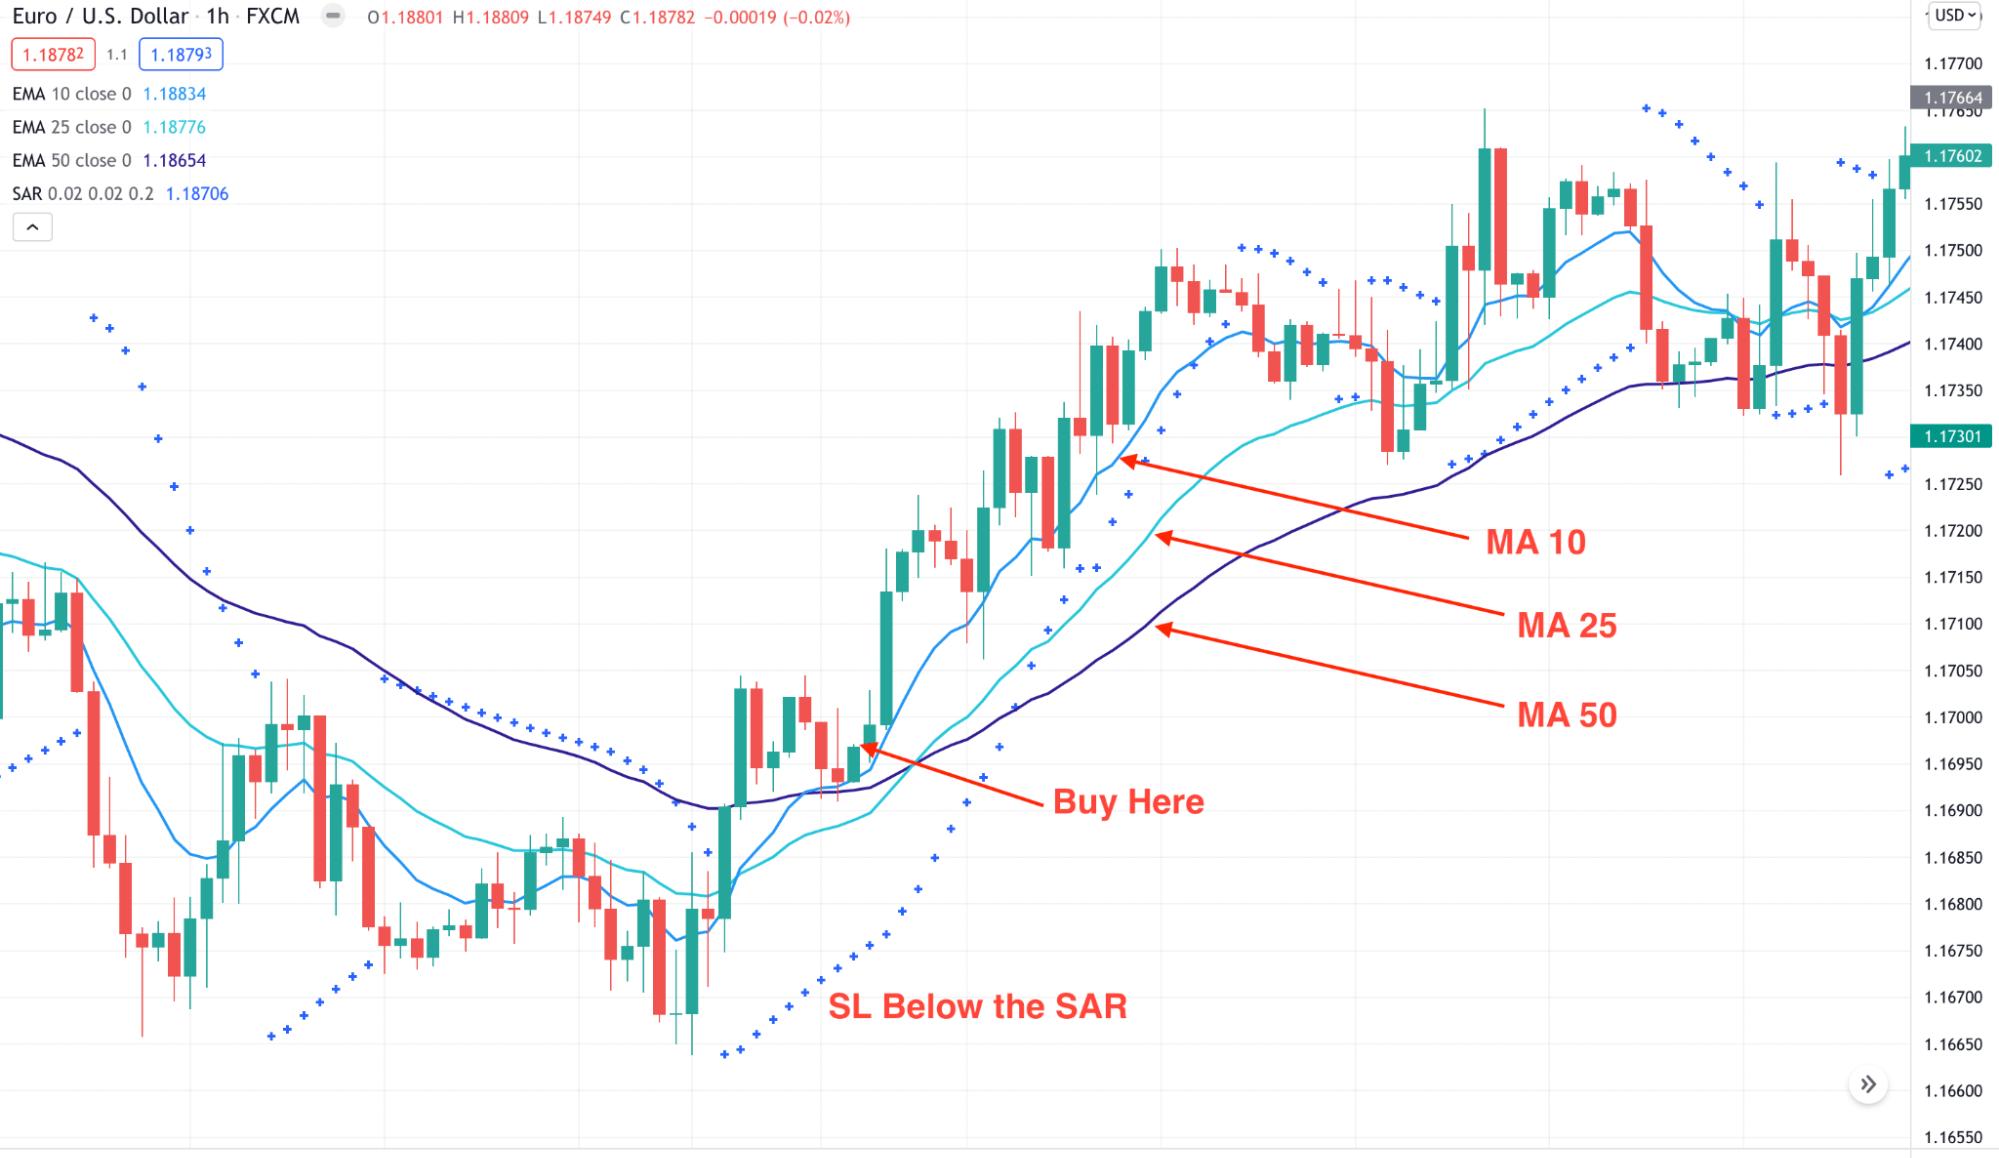 Parabolic profits scalping strategy